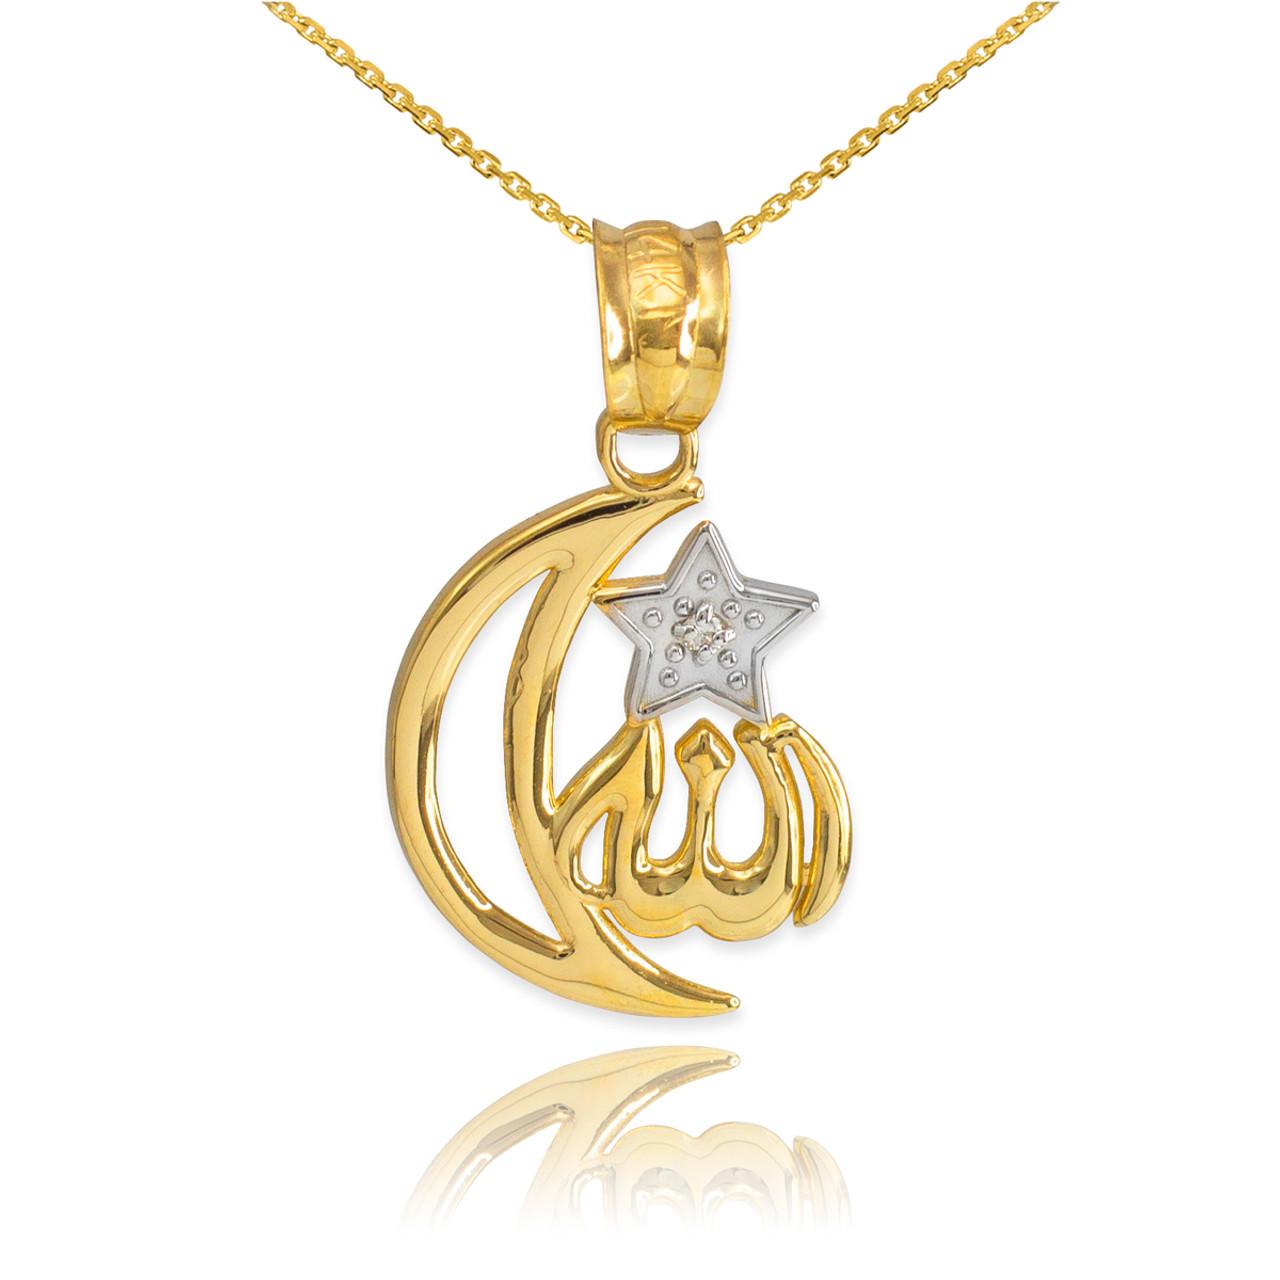 Gold Diamond Crescent Moon Allah Pendant Necklace